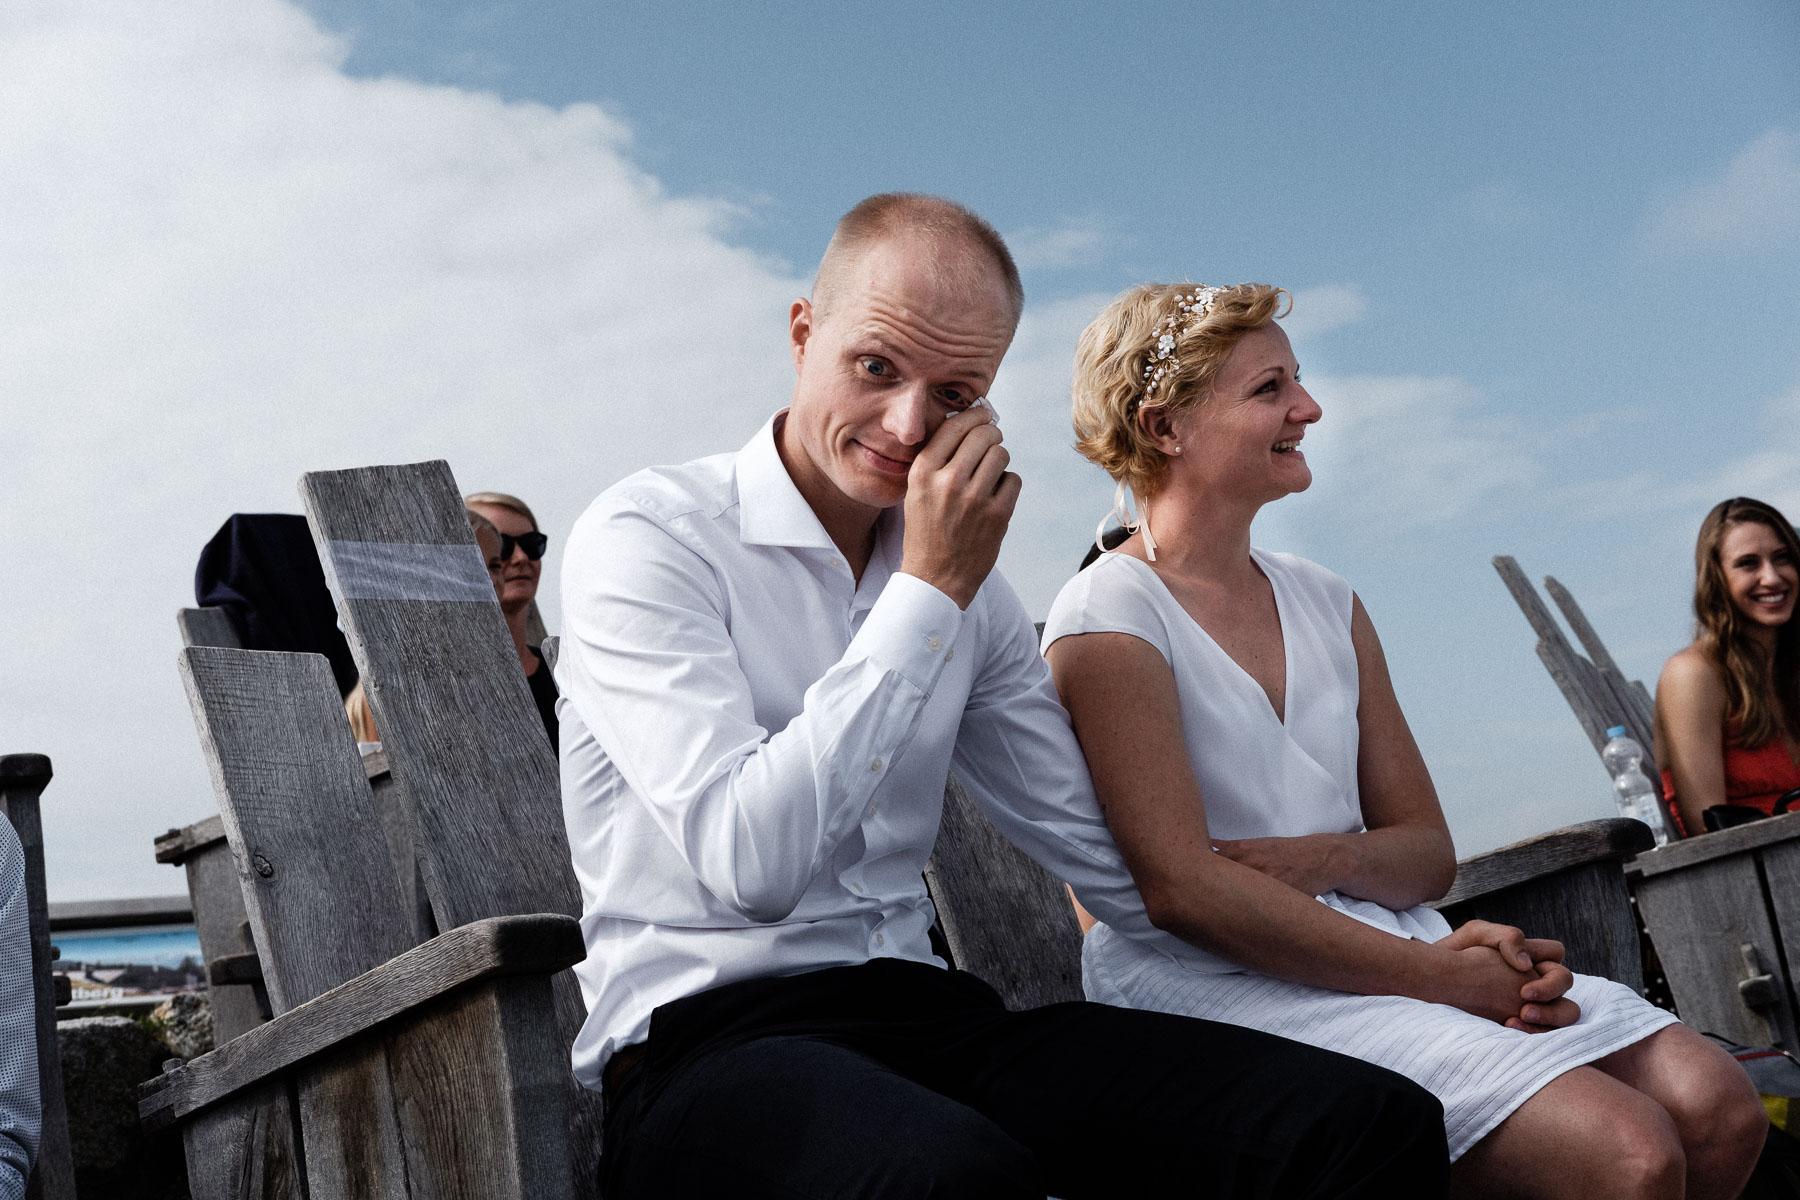 MartinLiebl_Hochzeitsfotograf_LCL_I_Blog_26.jpg